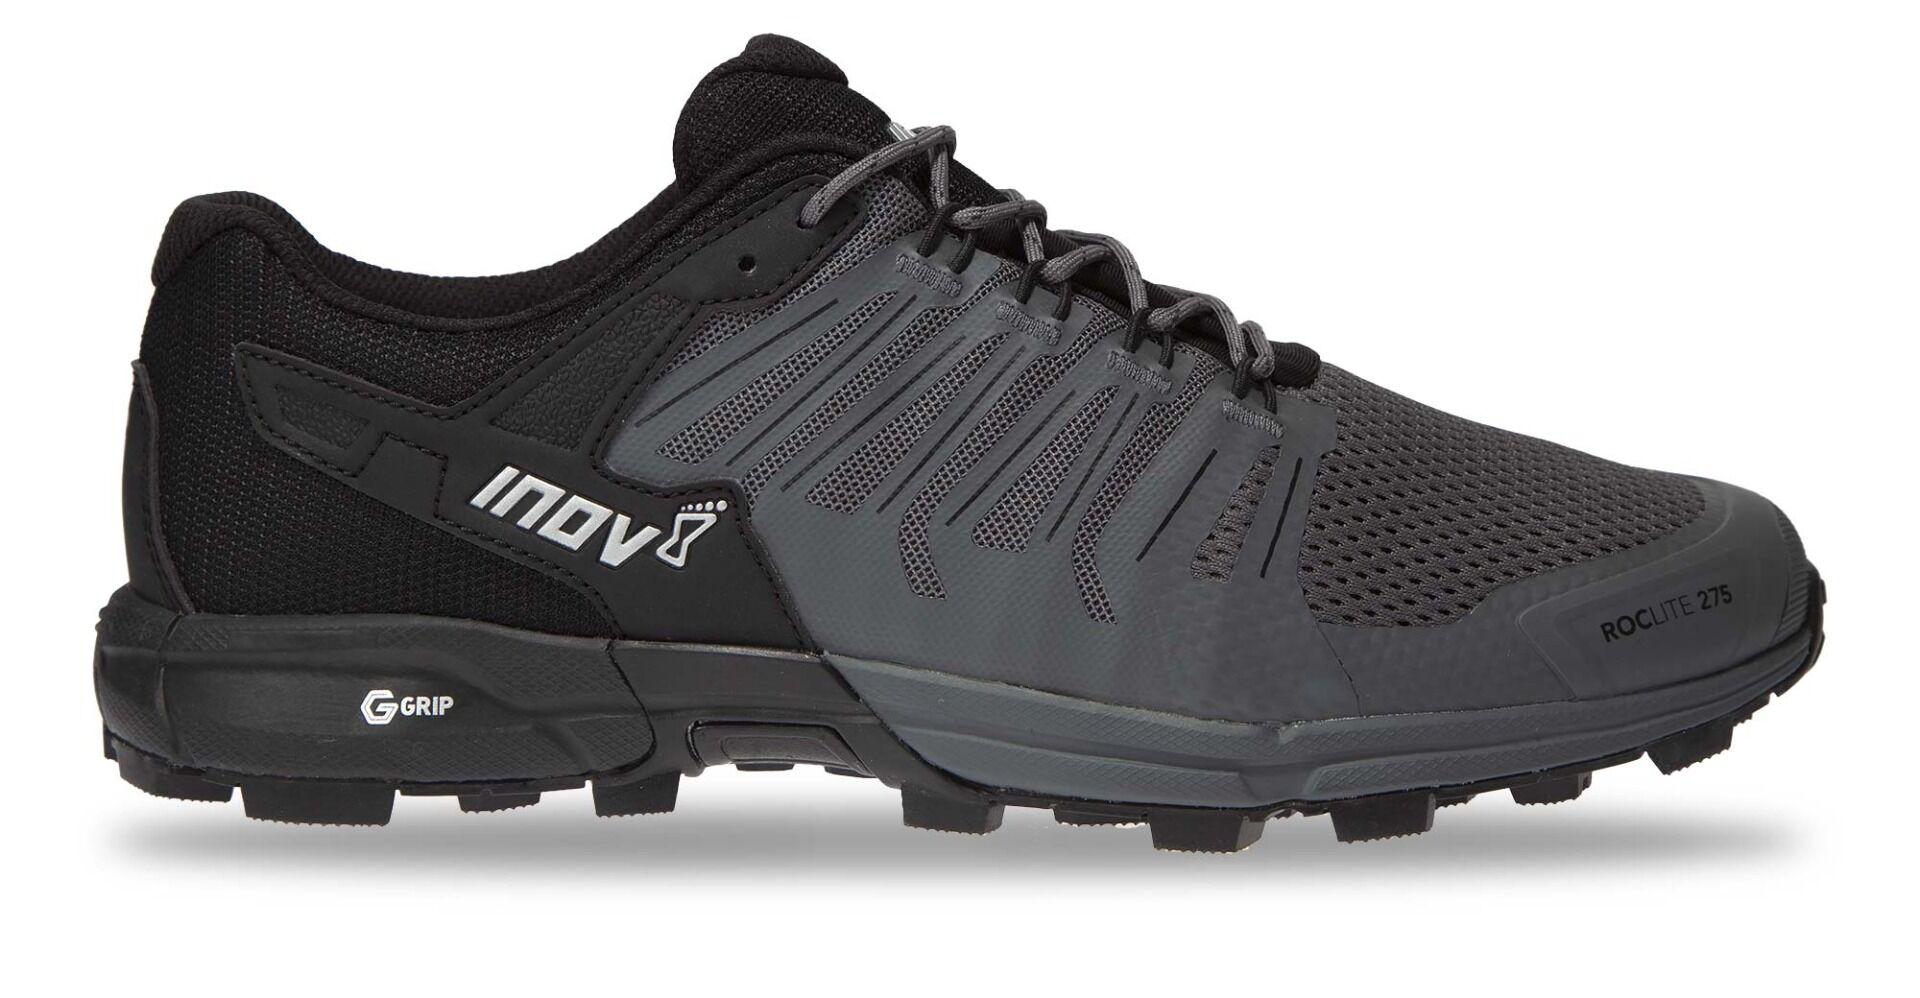 Roclite G 275 Men's Trail Running Shoes